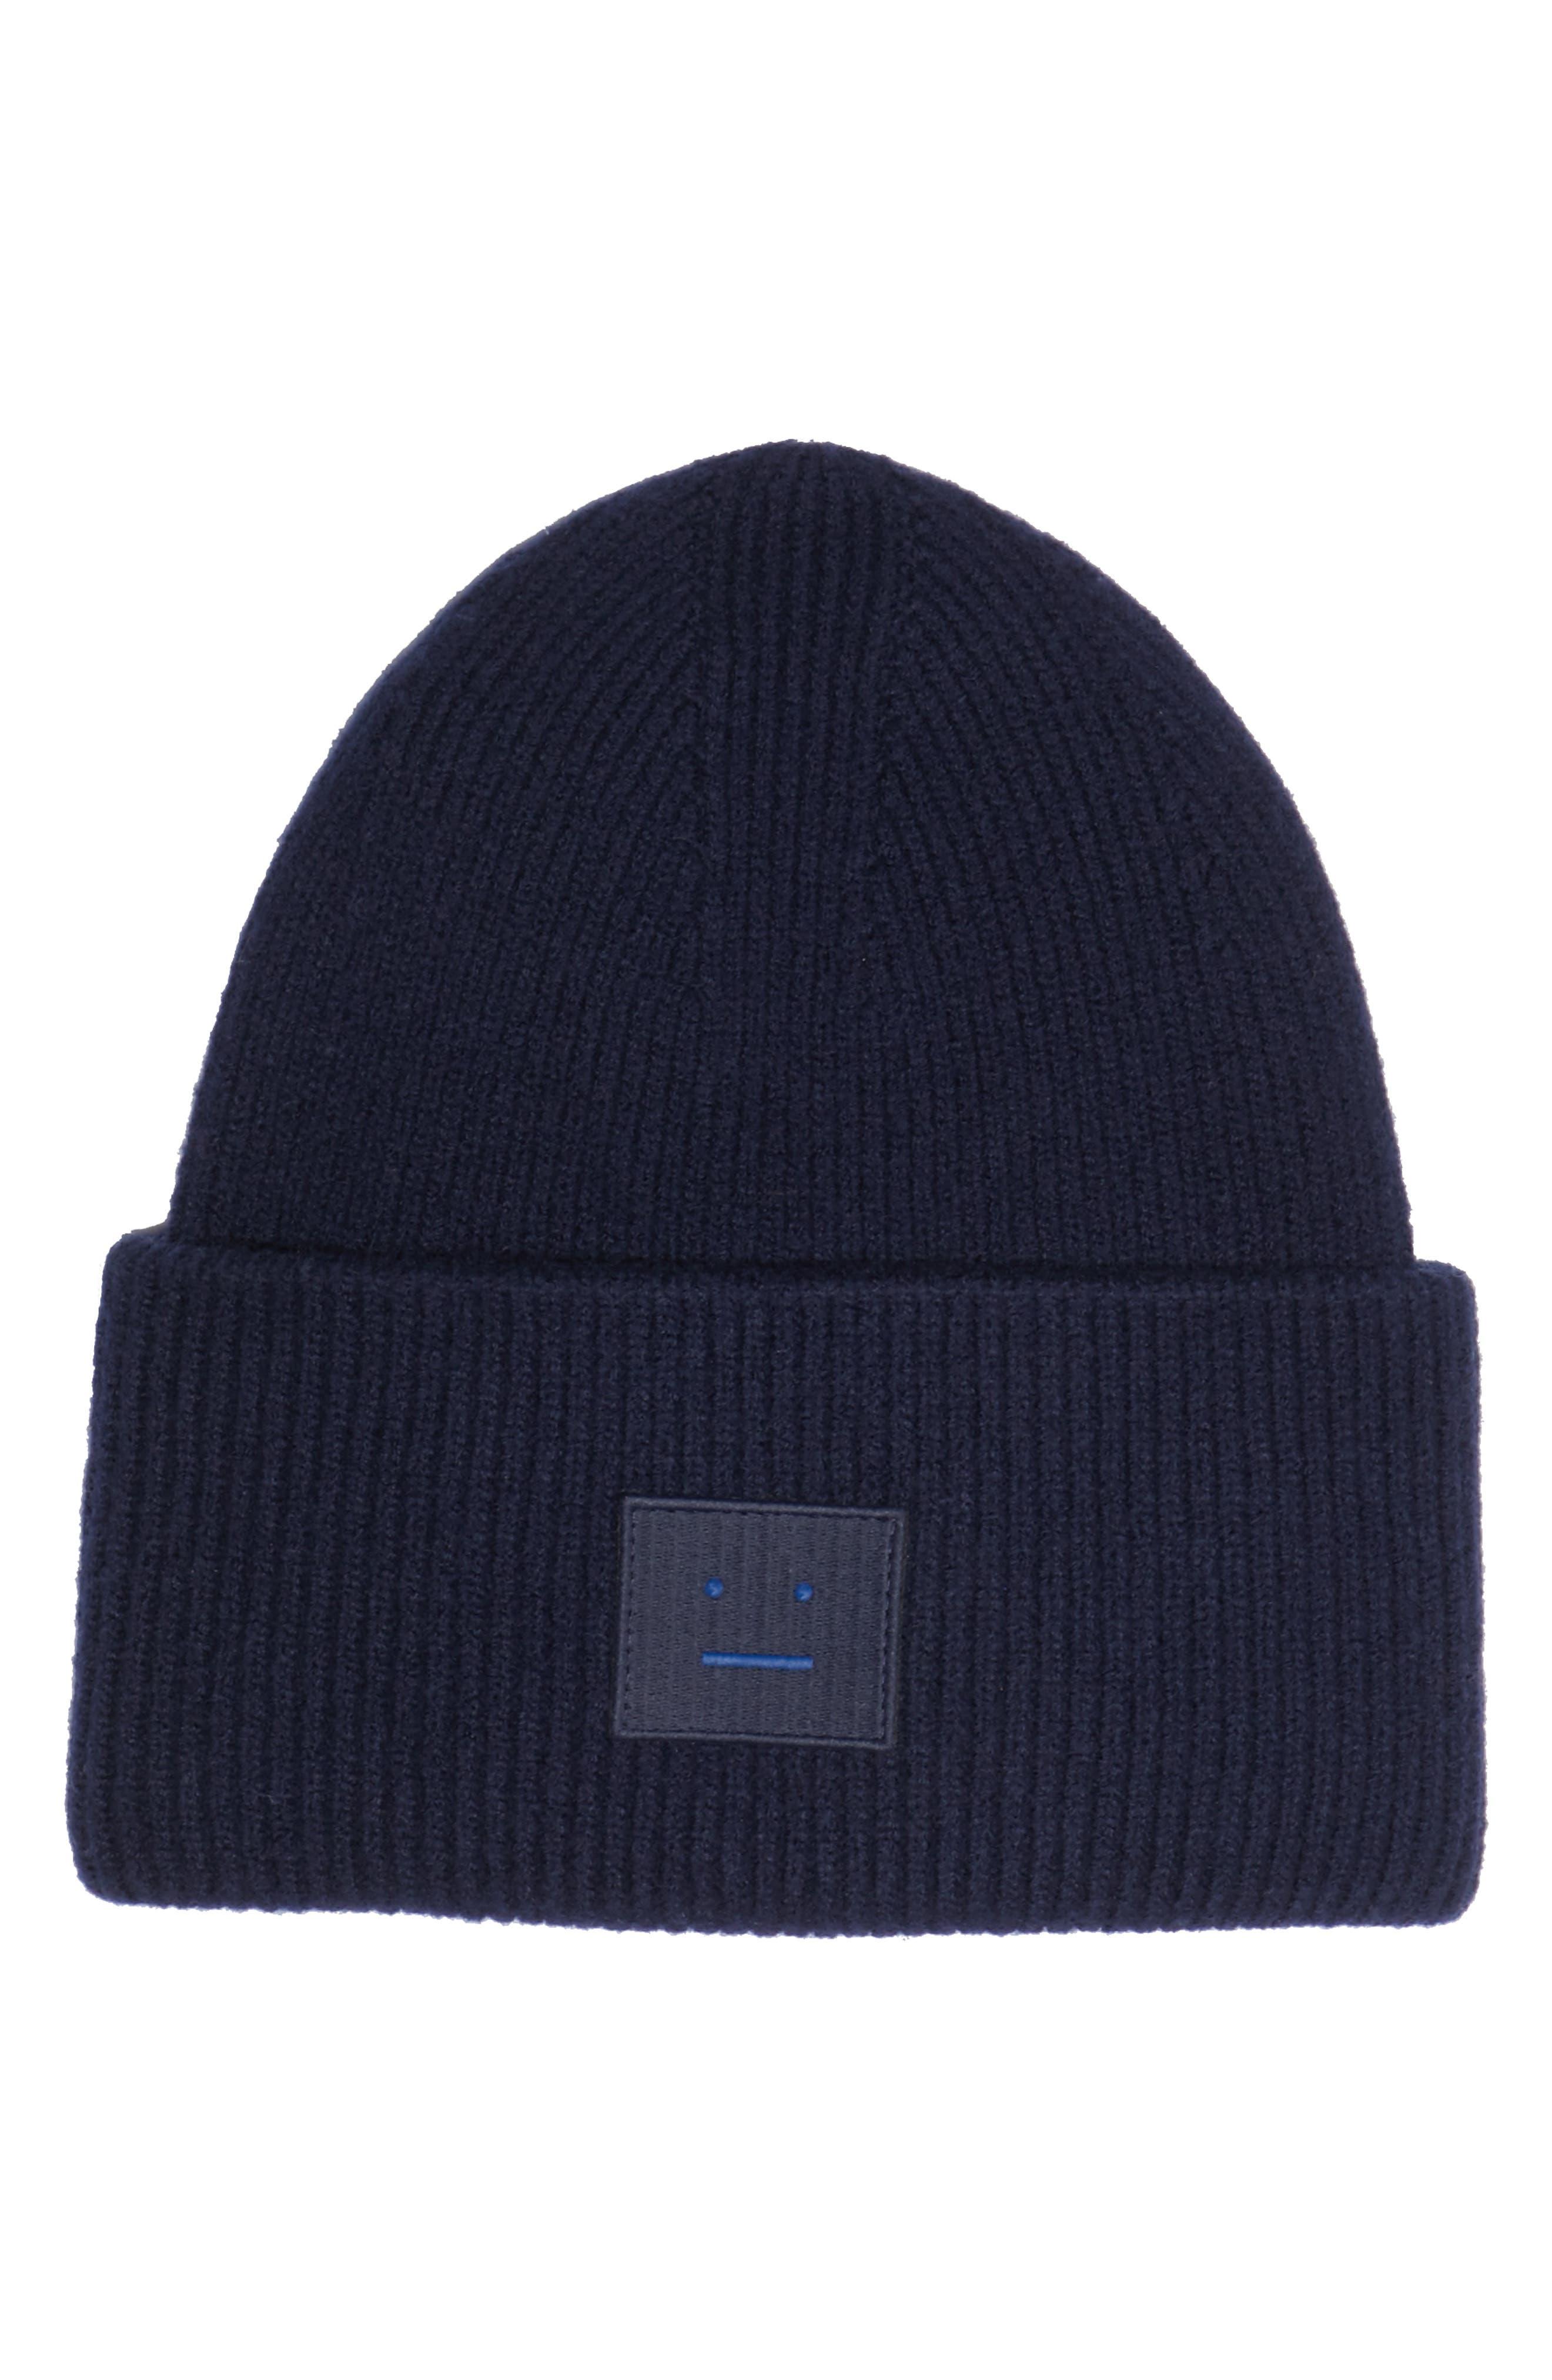 733f06b3412 Acne Studios Hats for Women